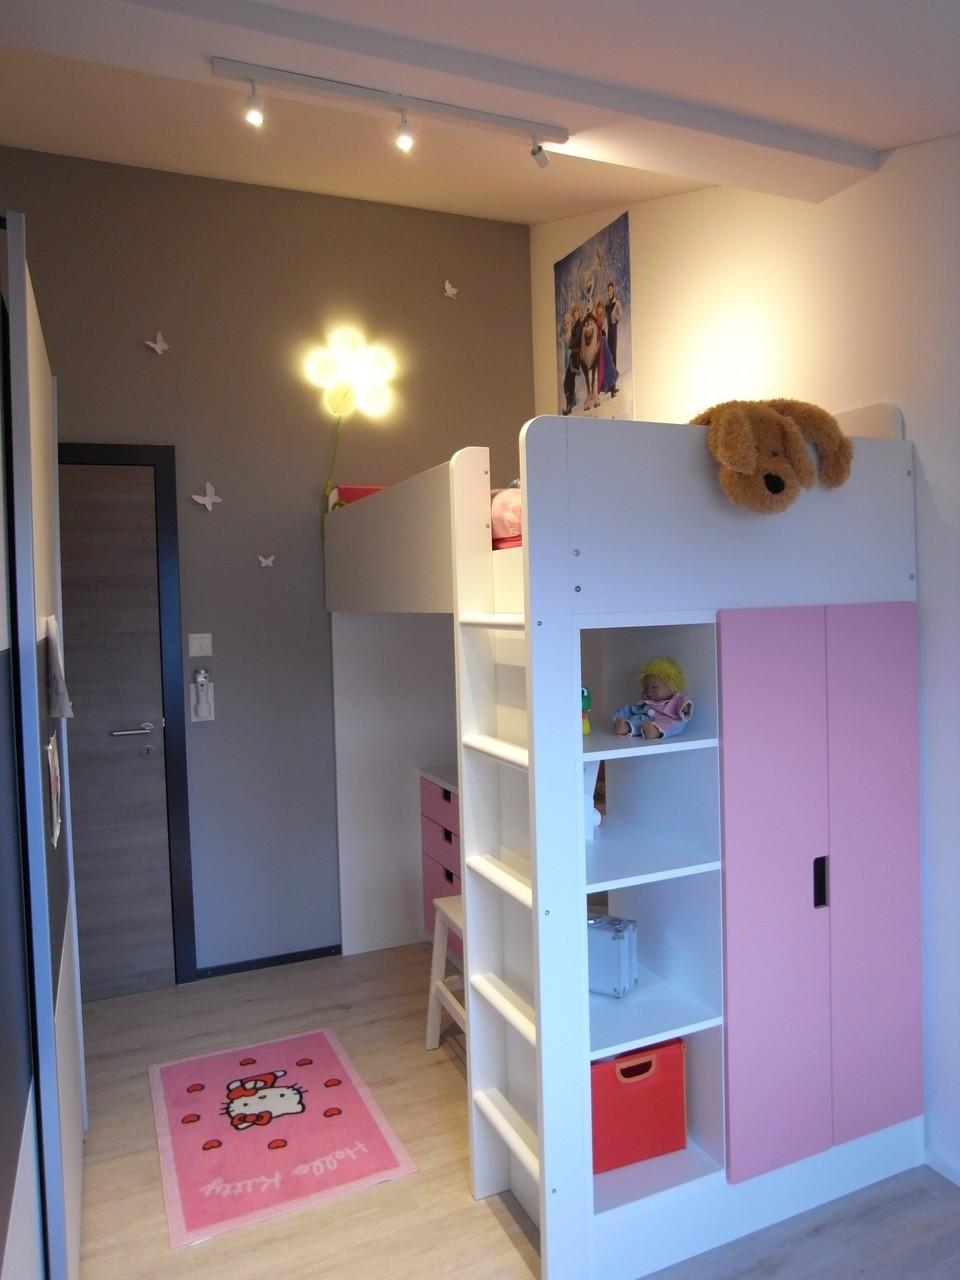 20.02.16 - Kinderzimmer 1